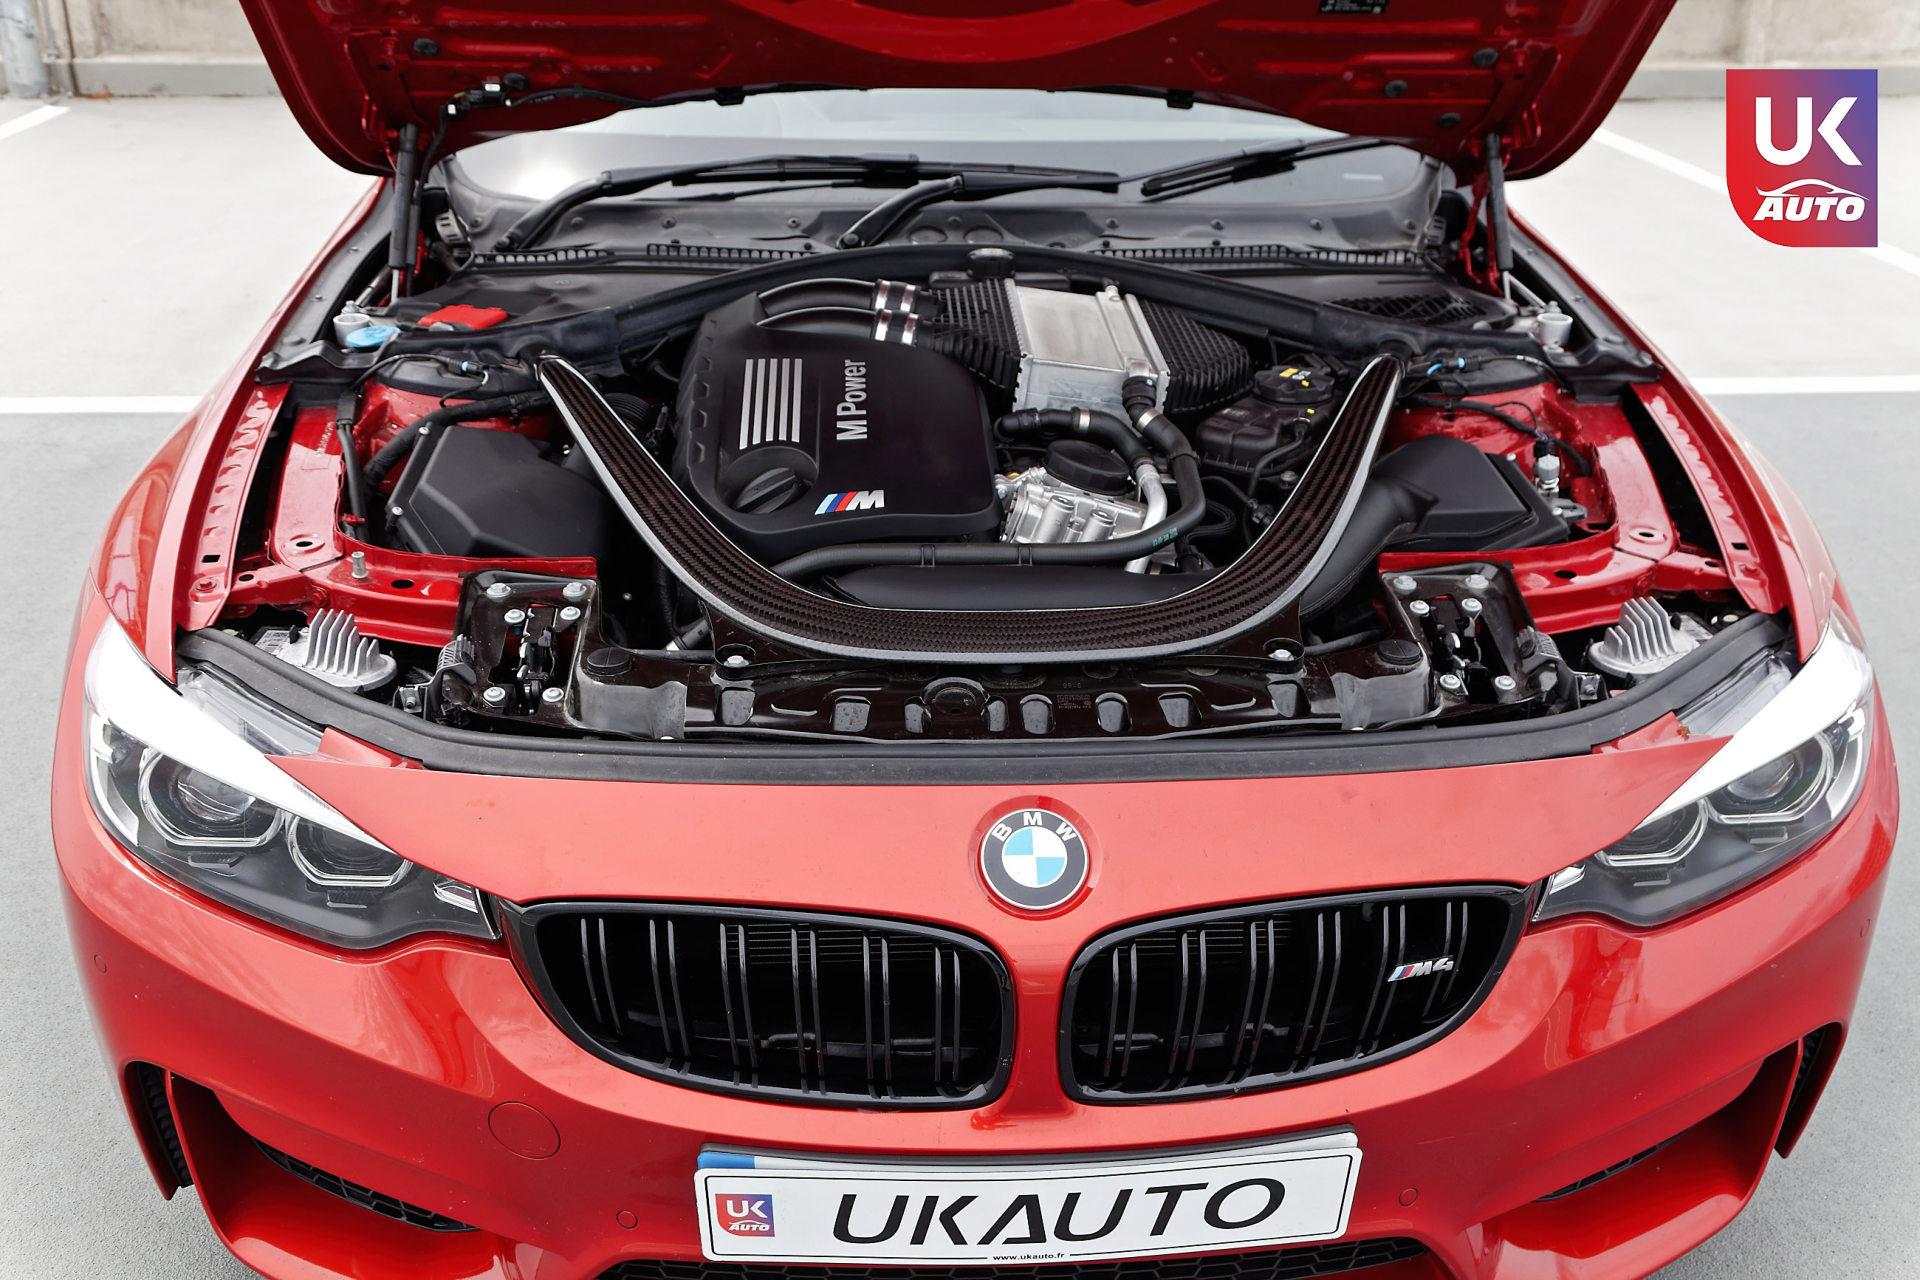 BMW M4 PACK COMPETITION BMW ANGLETERRE BMW IMPORT UK BMW MANDATAIRE AUTO8 DxO - IMPORTATION BMW M4 BMW IMPORT ROYAUME UNI BMW M4 COMPETITION RHD CLIENT UKAUTO